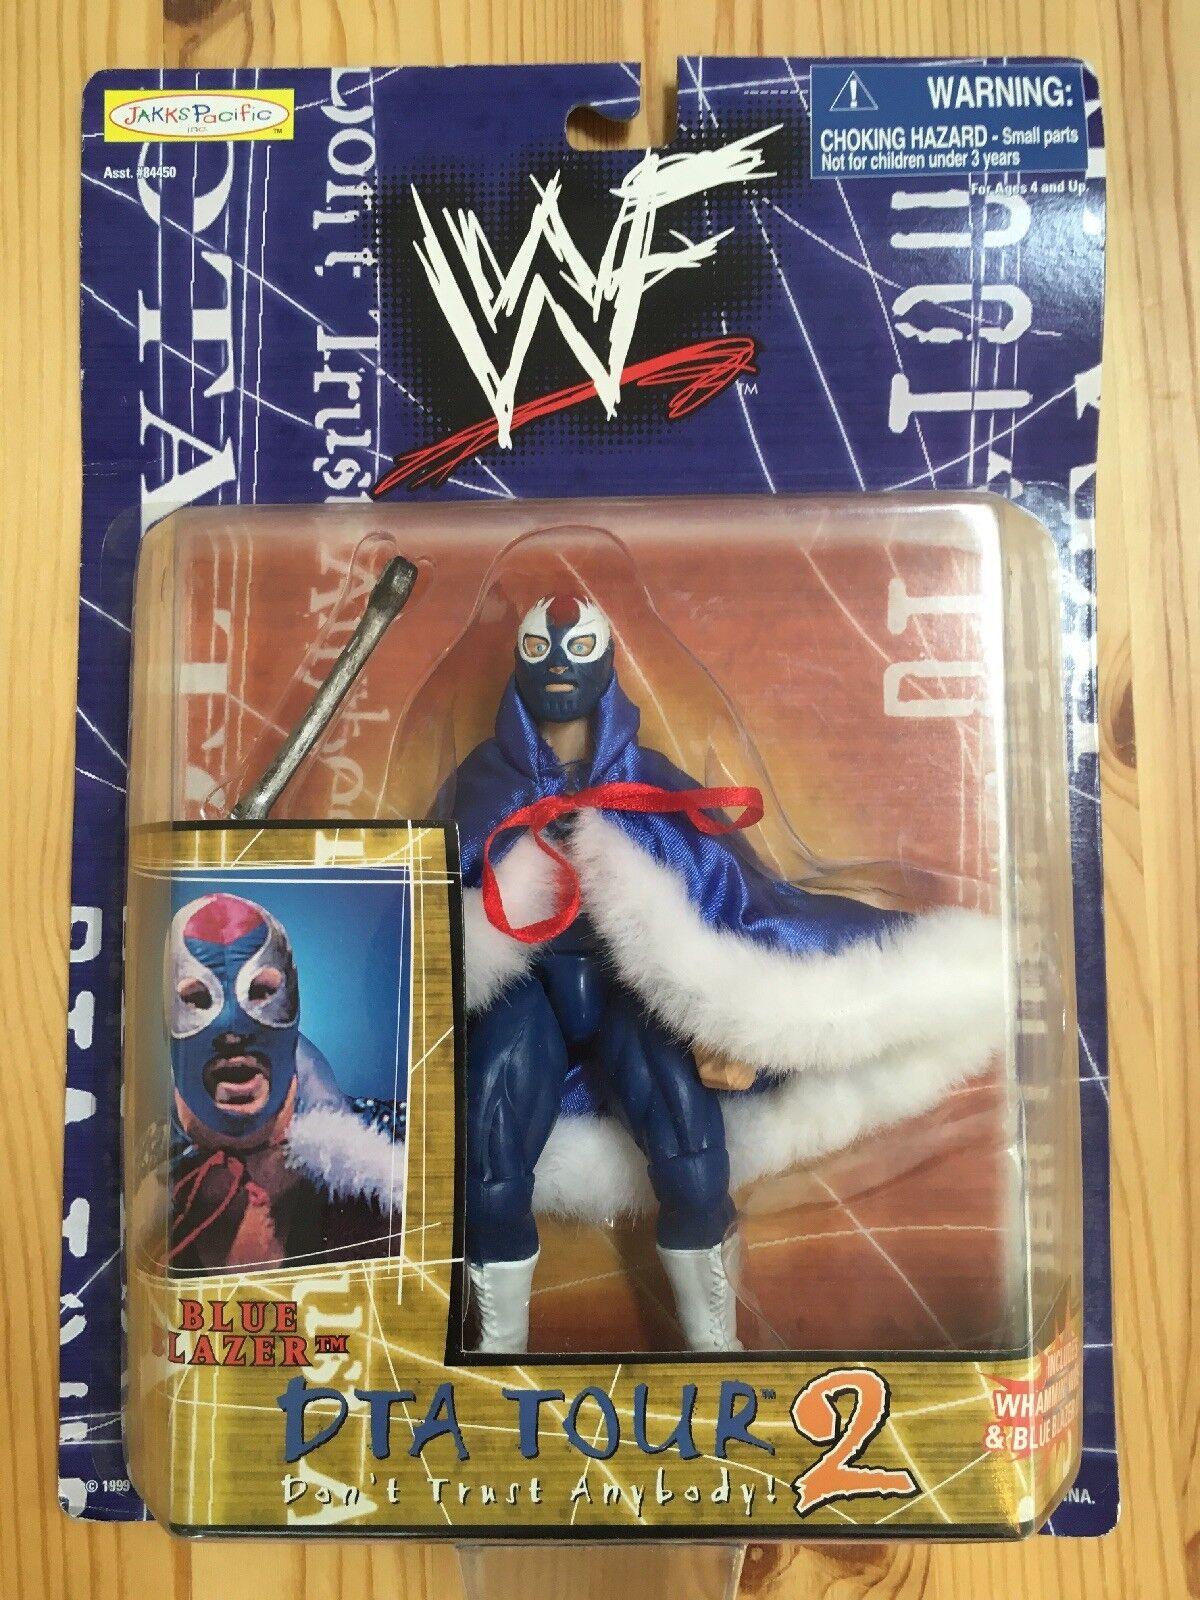 bluee Blazer Owen Hart Wwf Wwe Wrestling Figure Carded Ecw Wcw Njpw Jakks